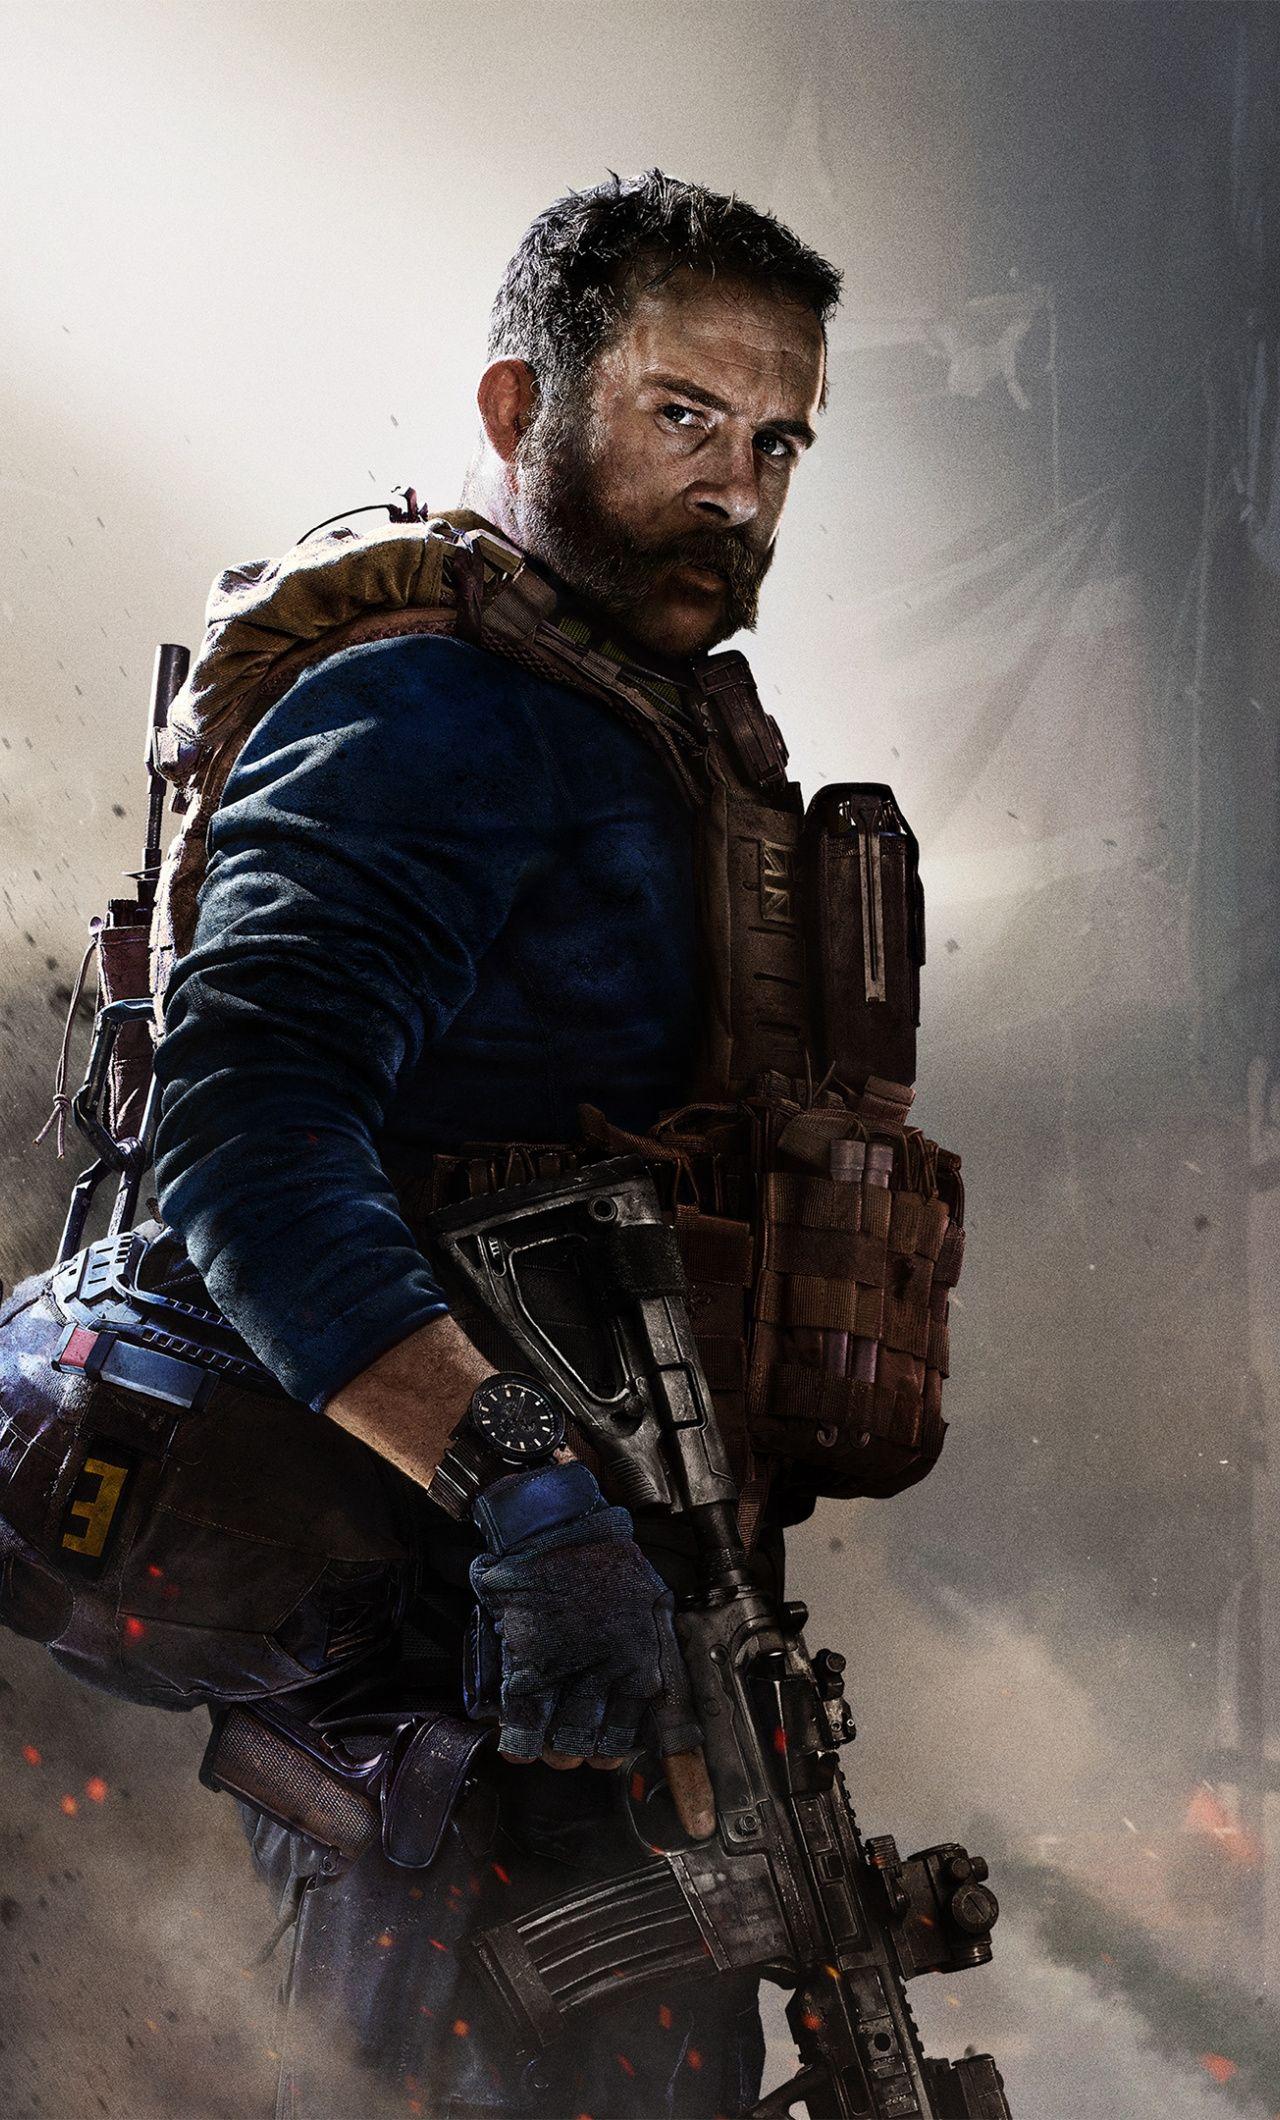 1280x2120 Call Of Duty Modern Warfare 2019 Video Game Wallpaper Modern Warfare Call Of Duty Call Of Duty Black